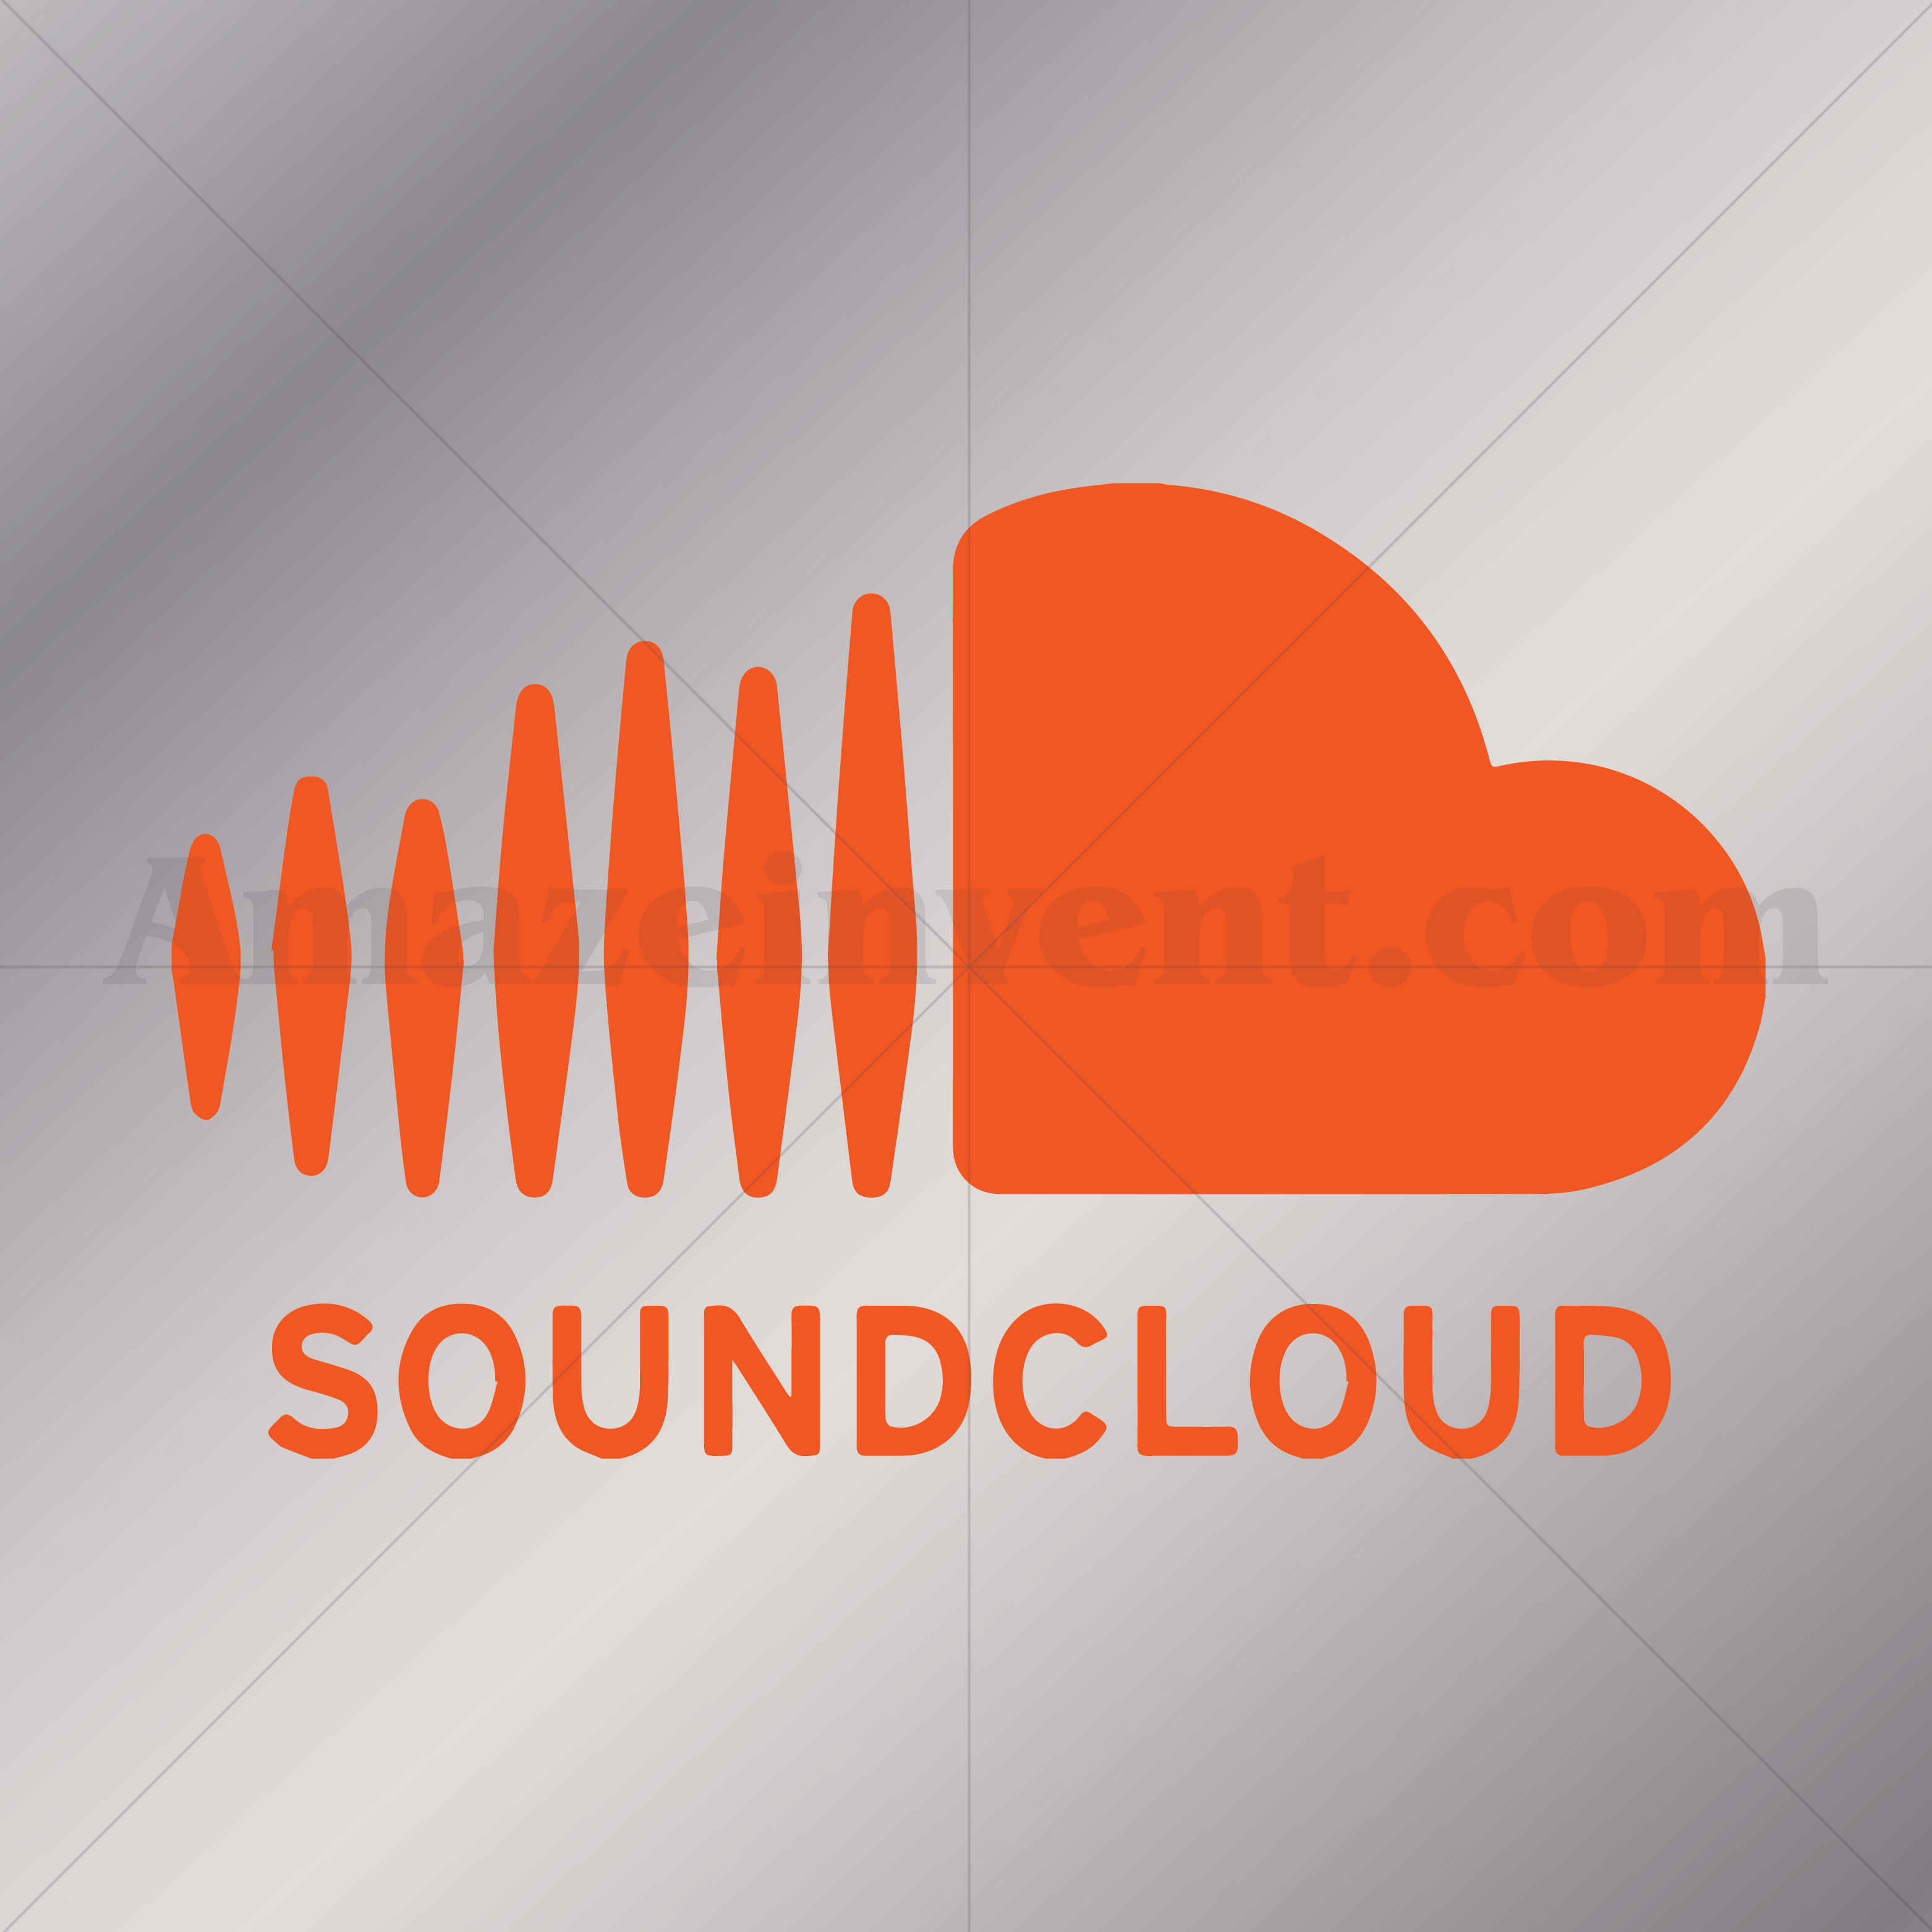 Android app SoundCloud